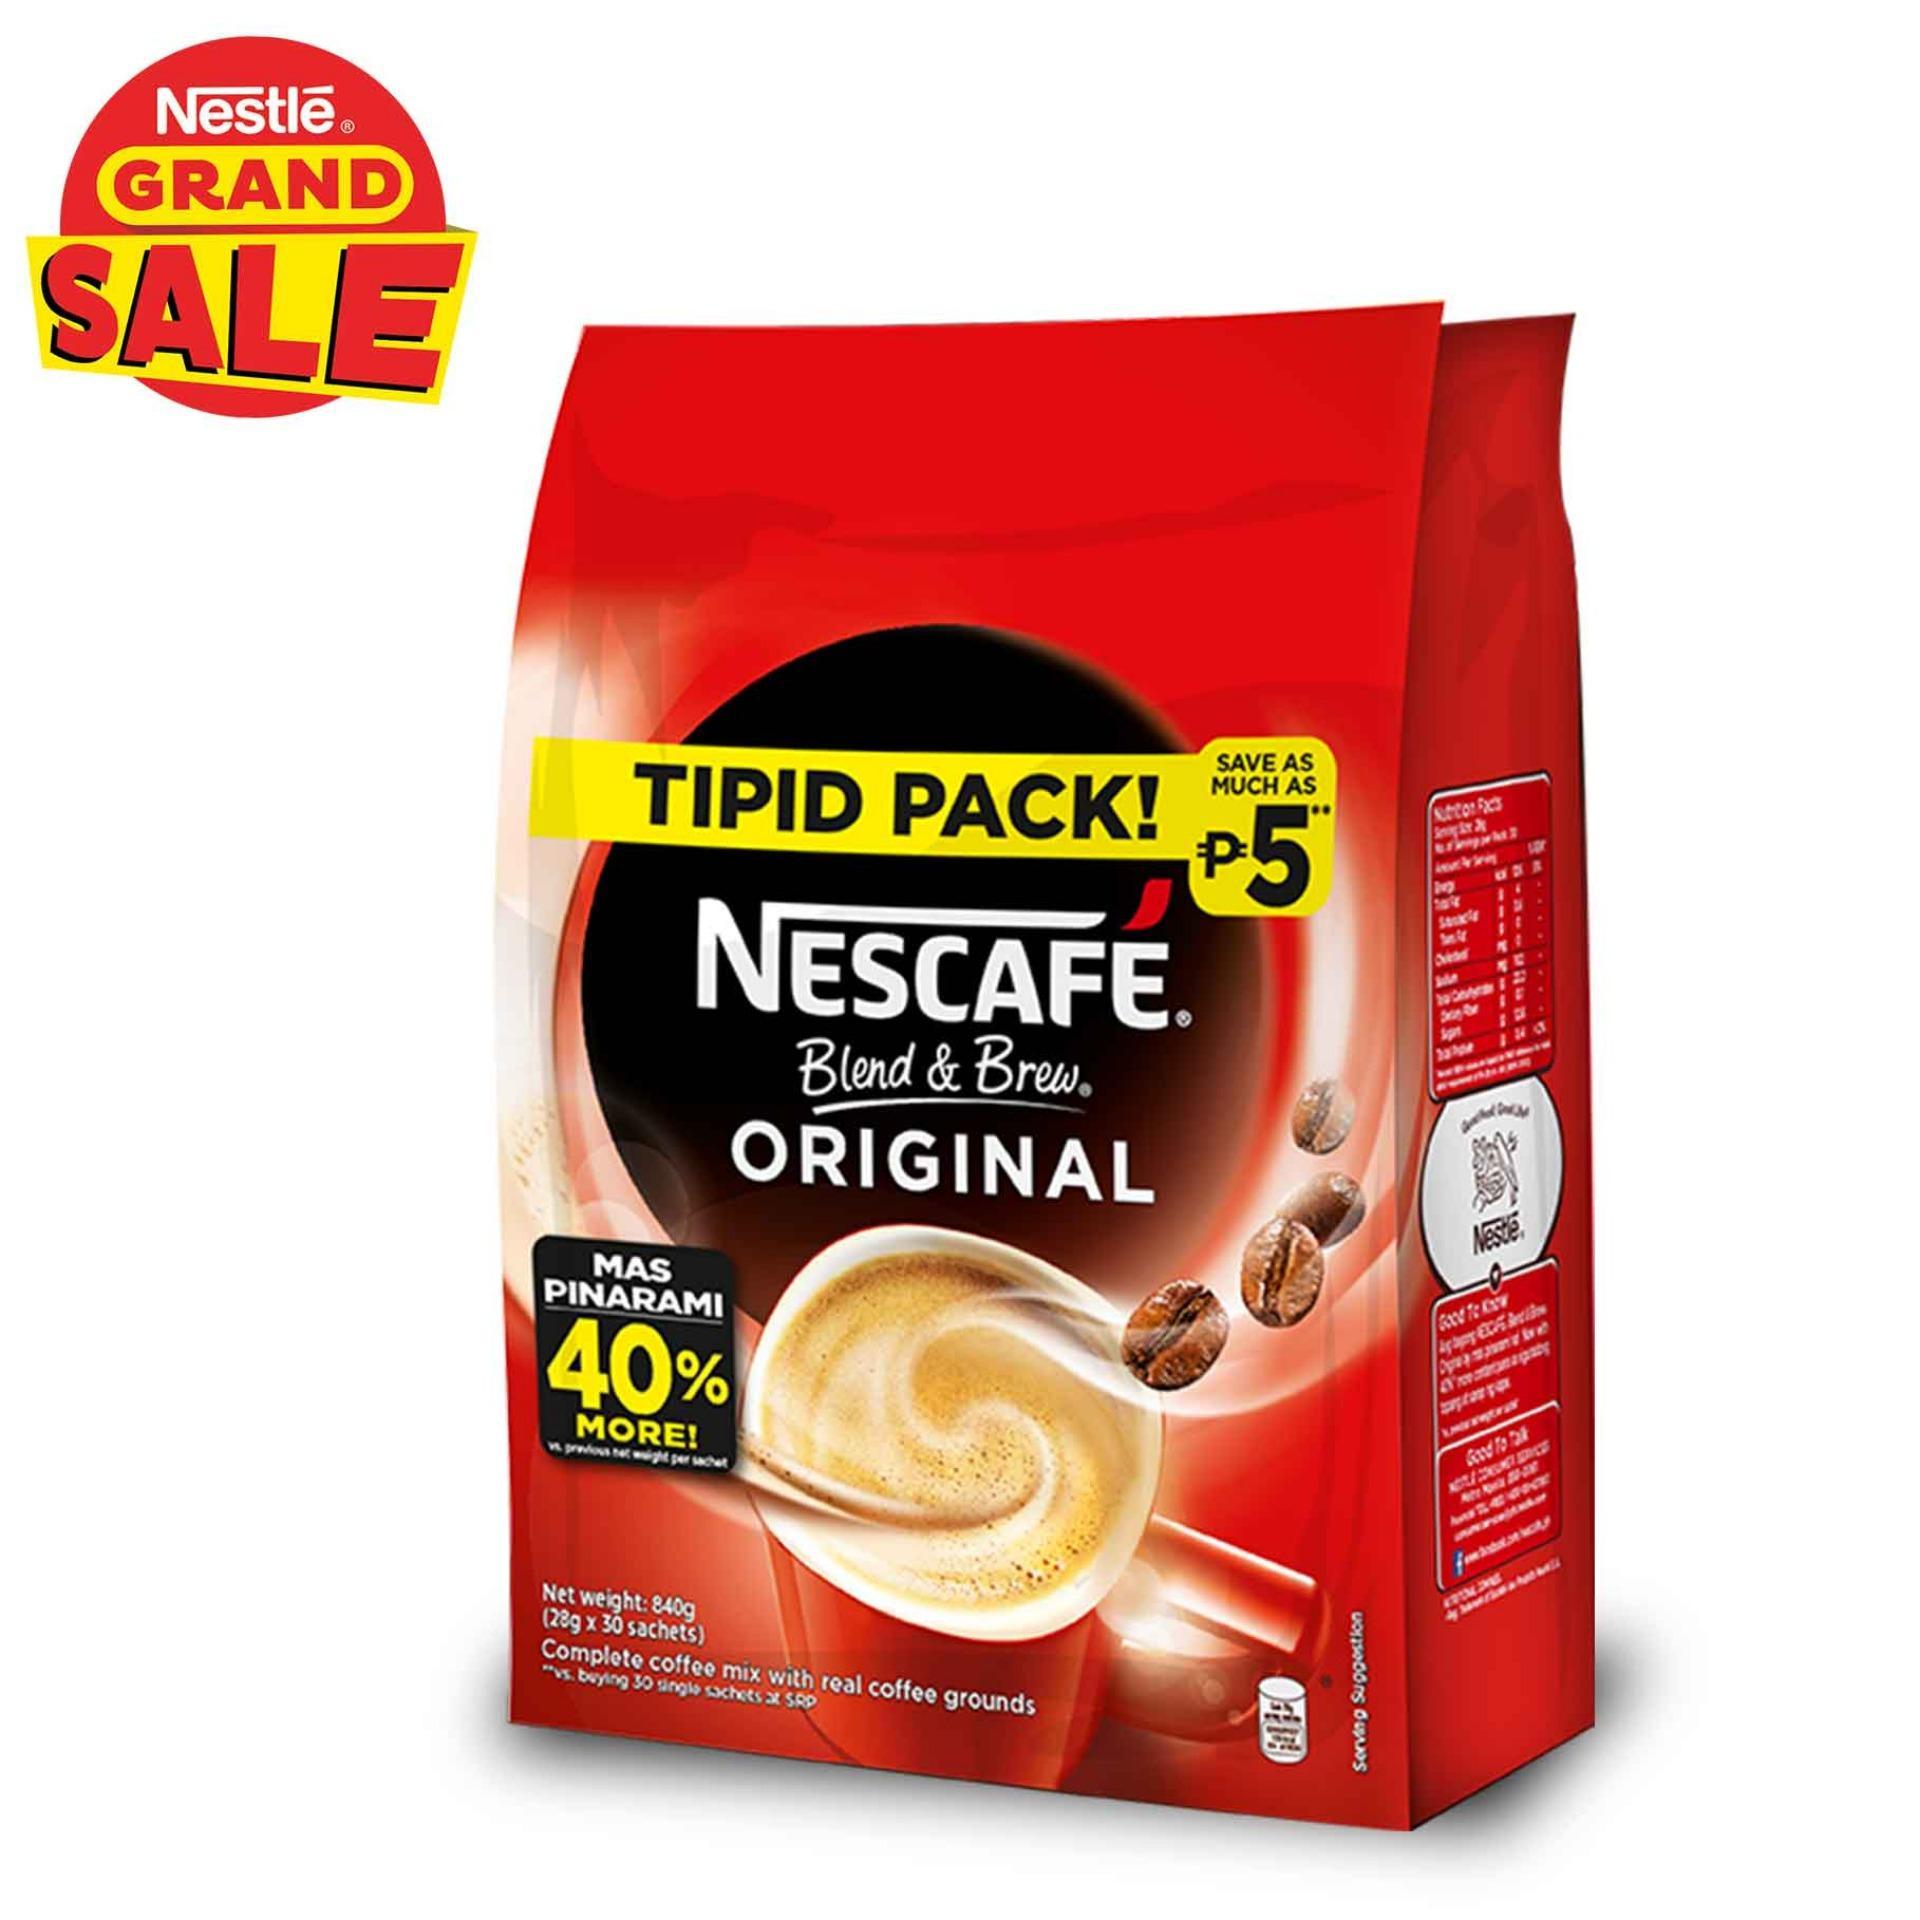 NESCAFE Blend and Brew Original 28g (Pack of 30)